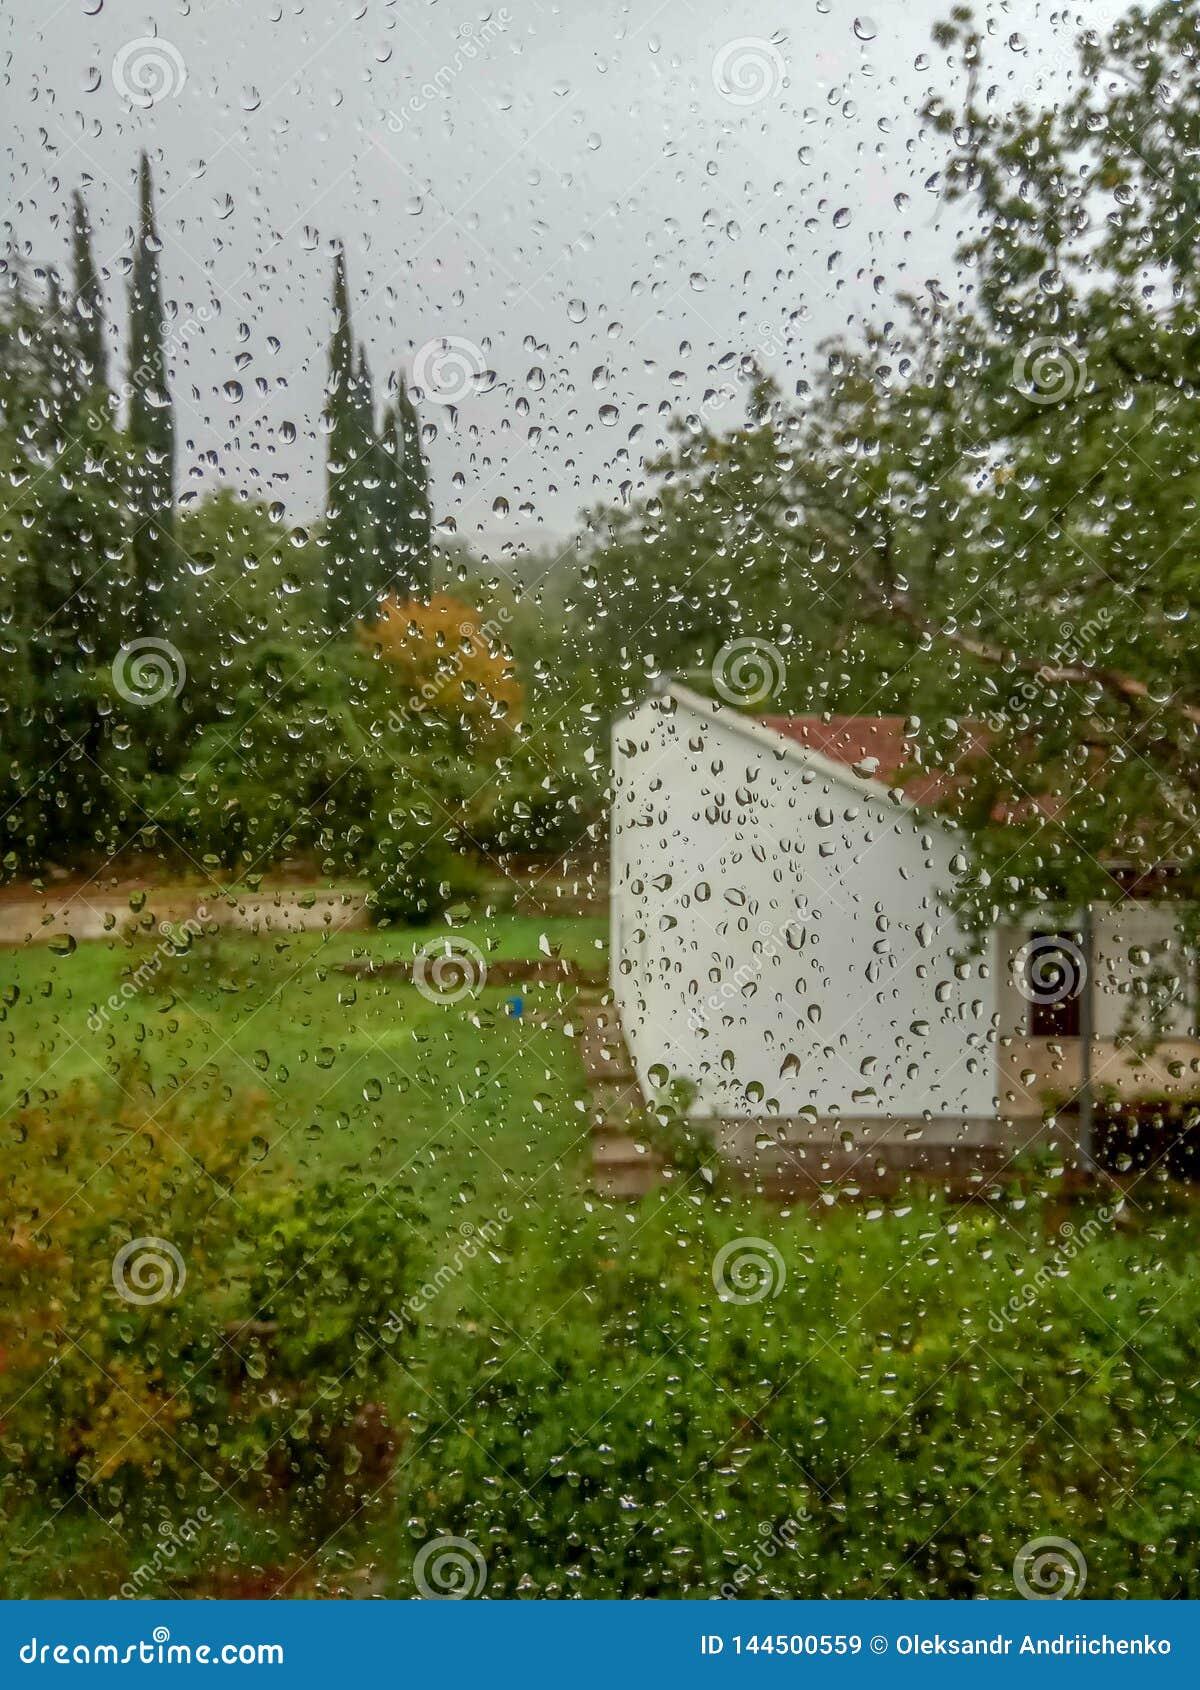 Raindrop on the windshield, it is raining outside